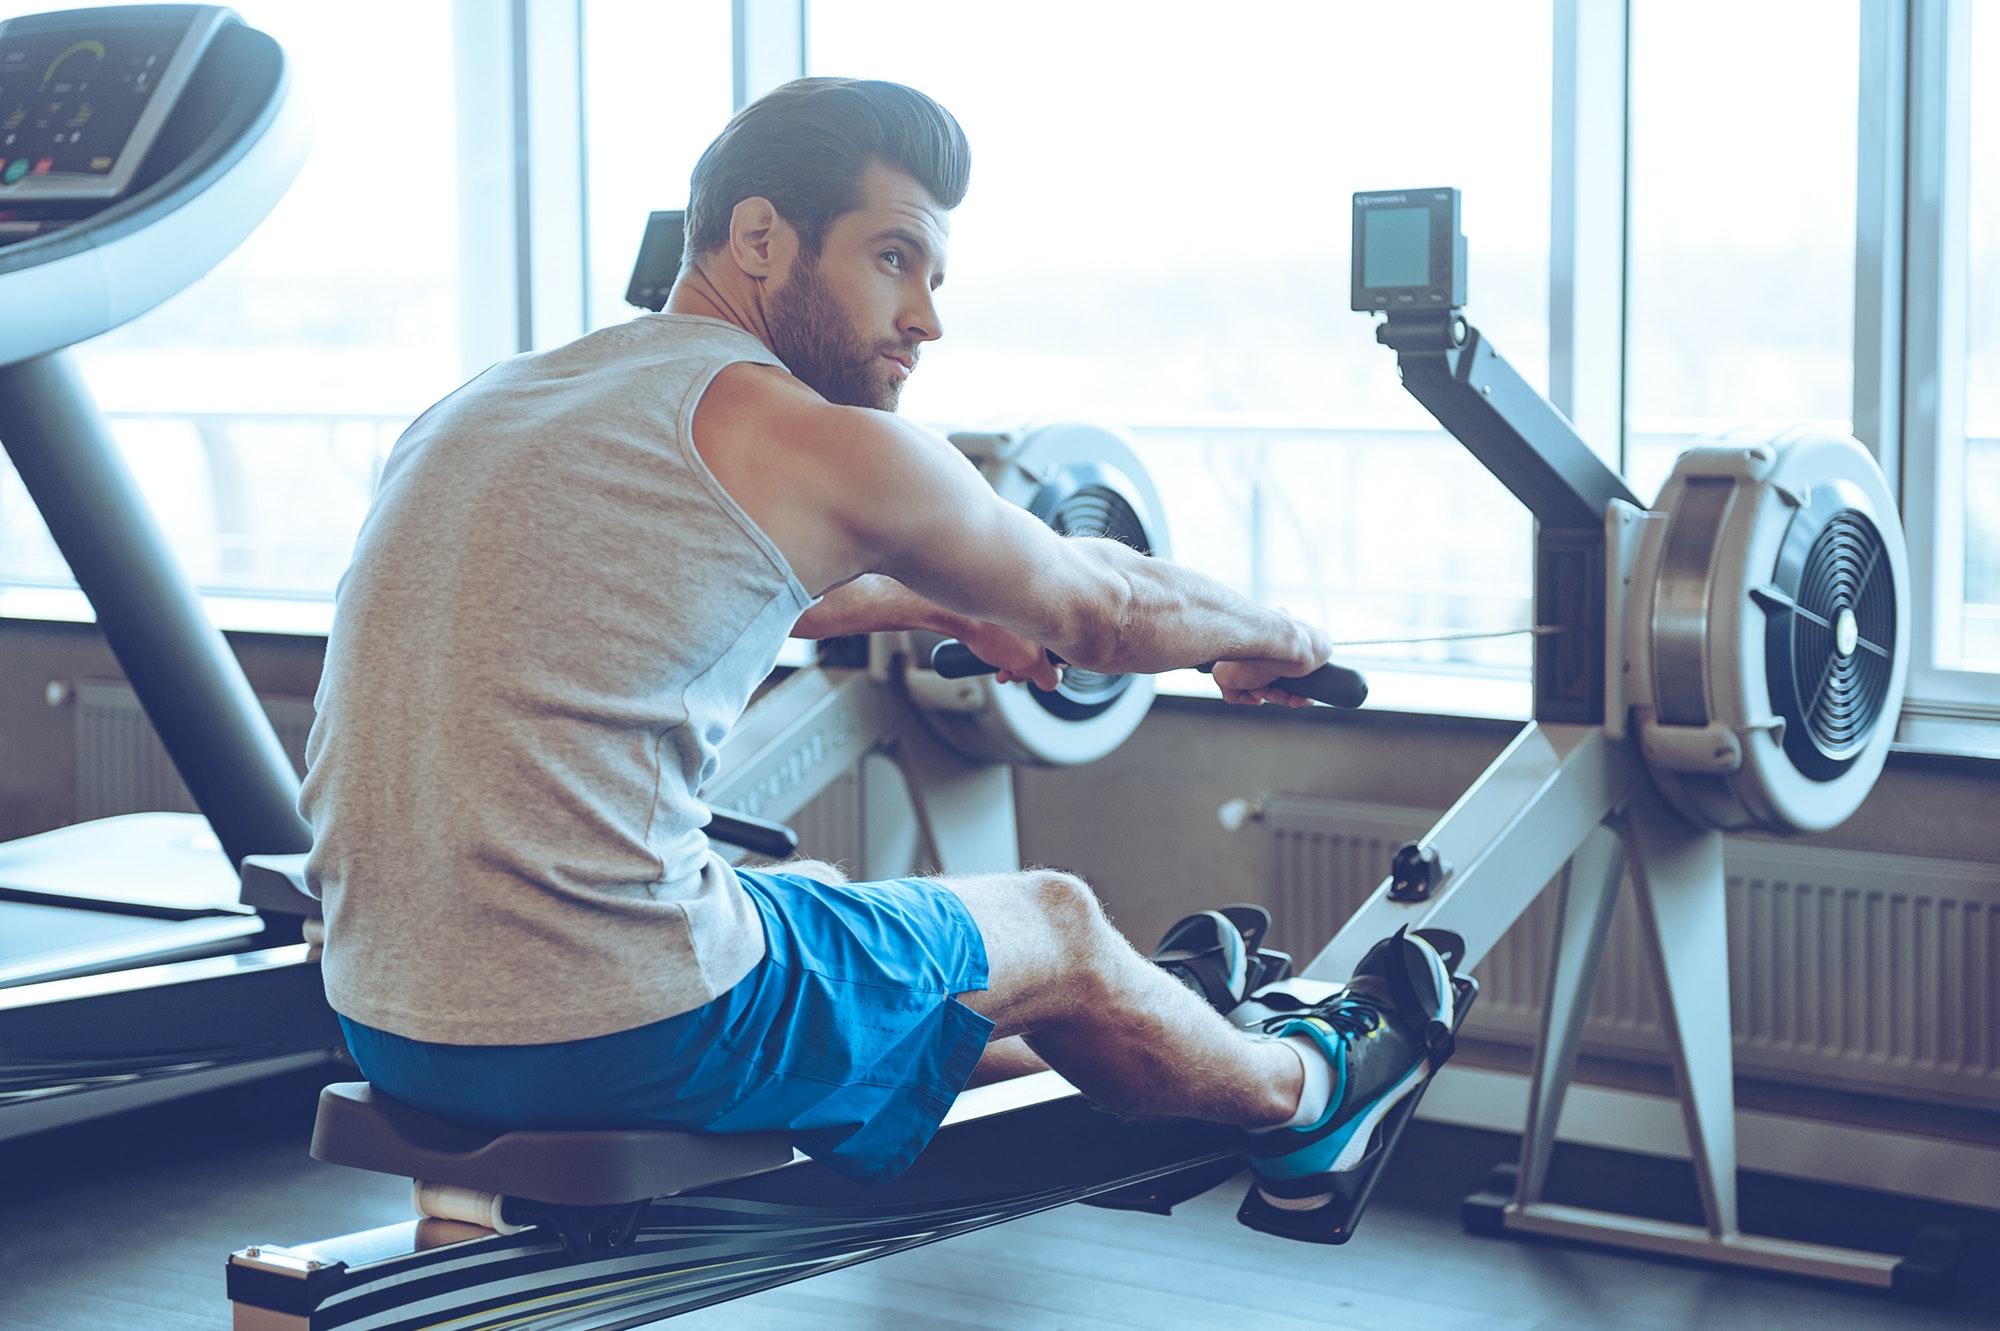 Rowing at gym.